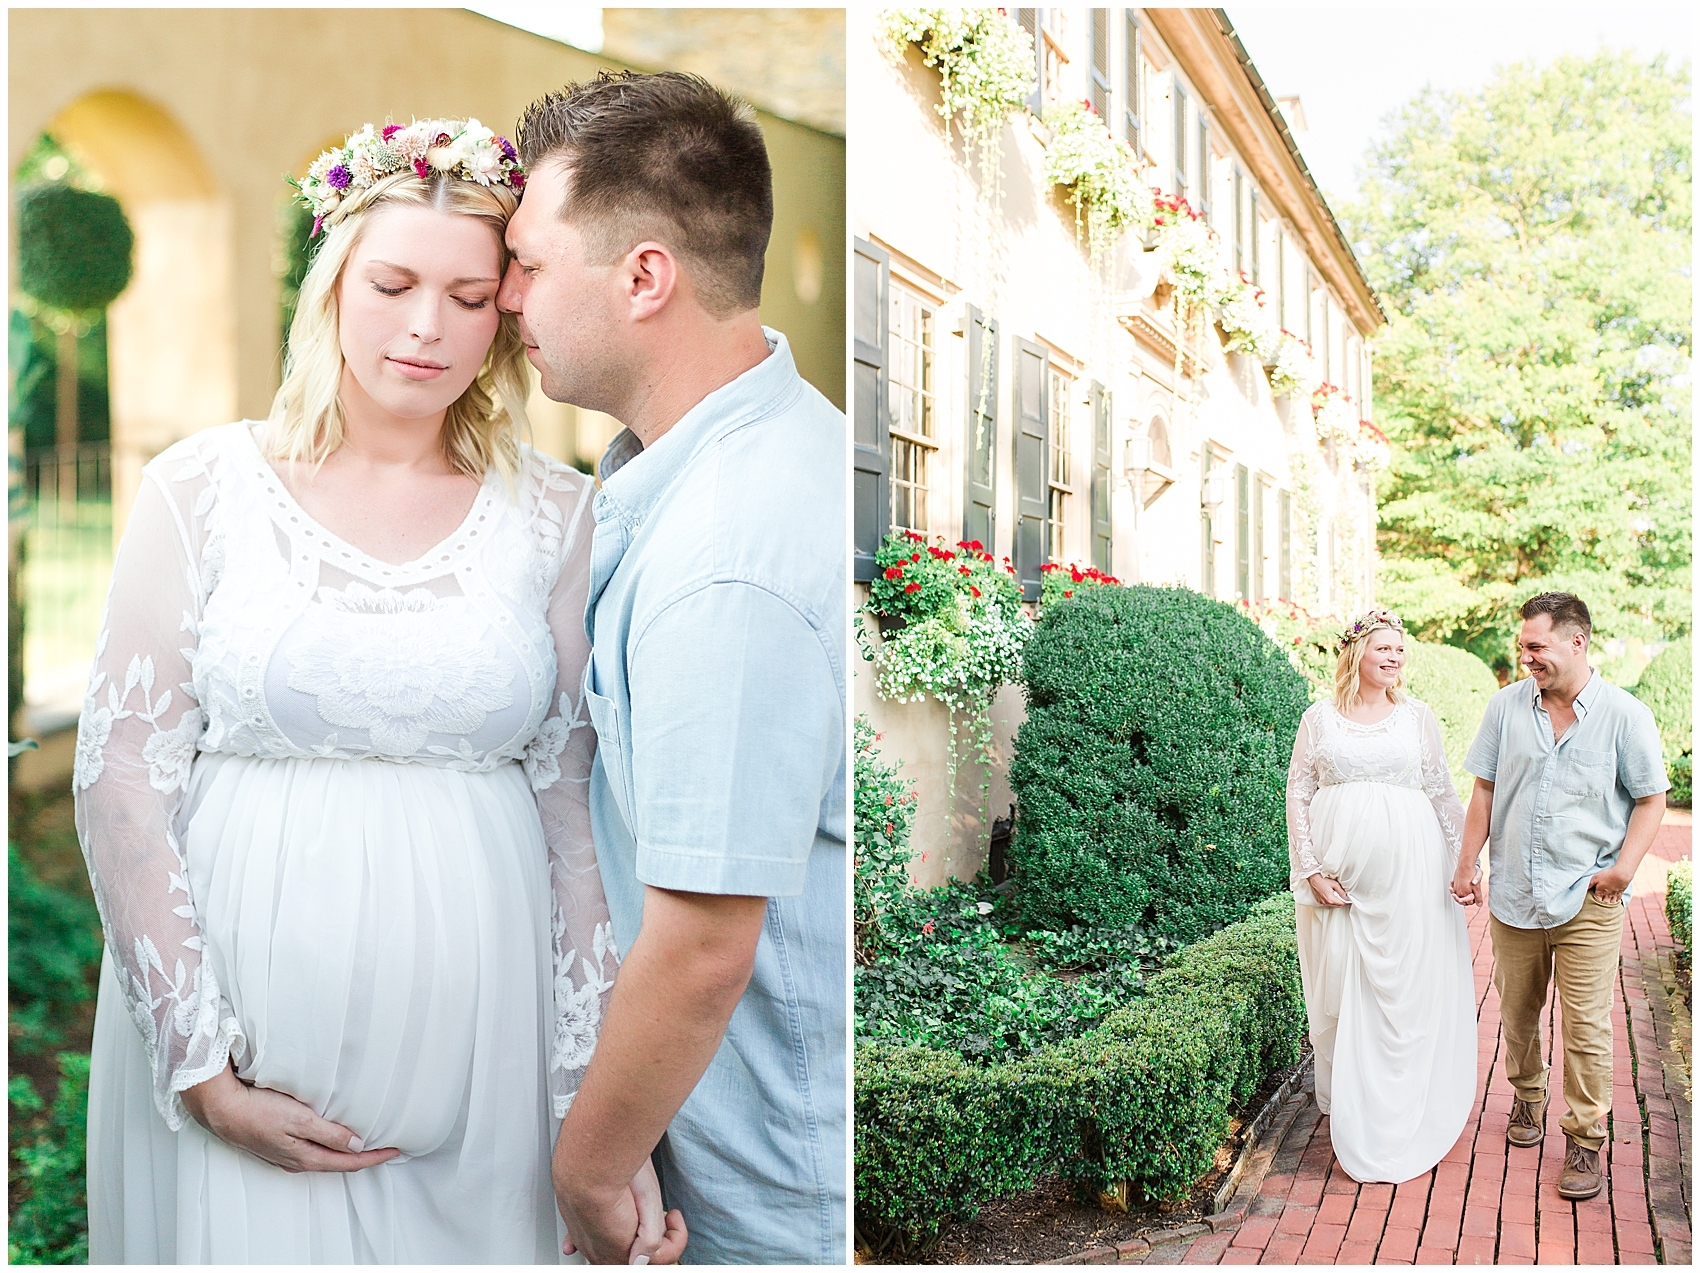 lancaster-pa-maternity-photographer-7.jpg